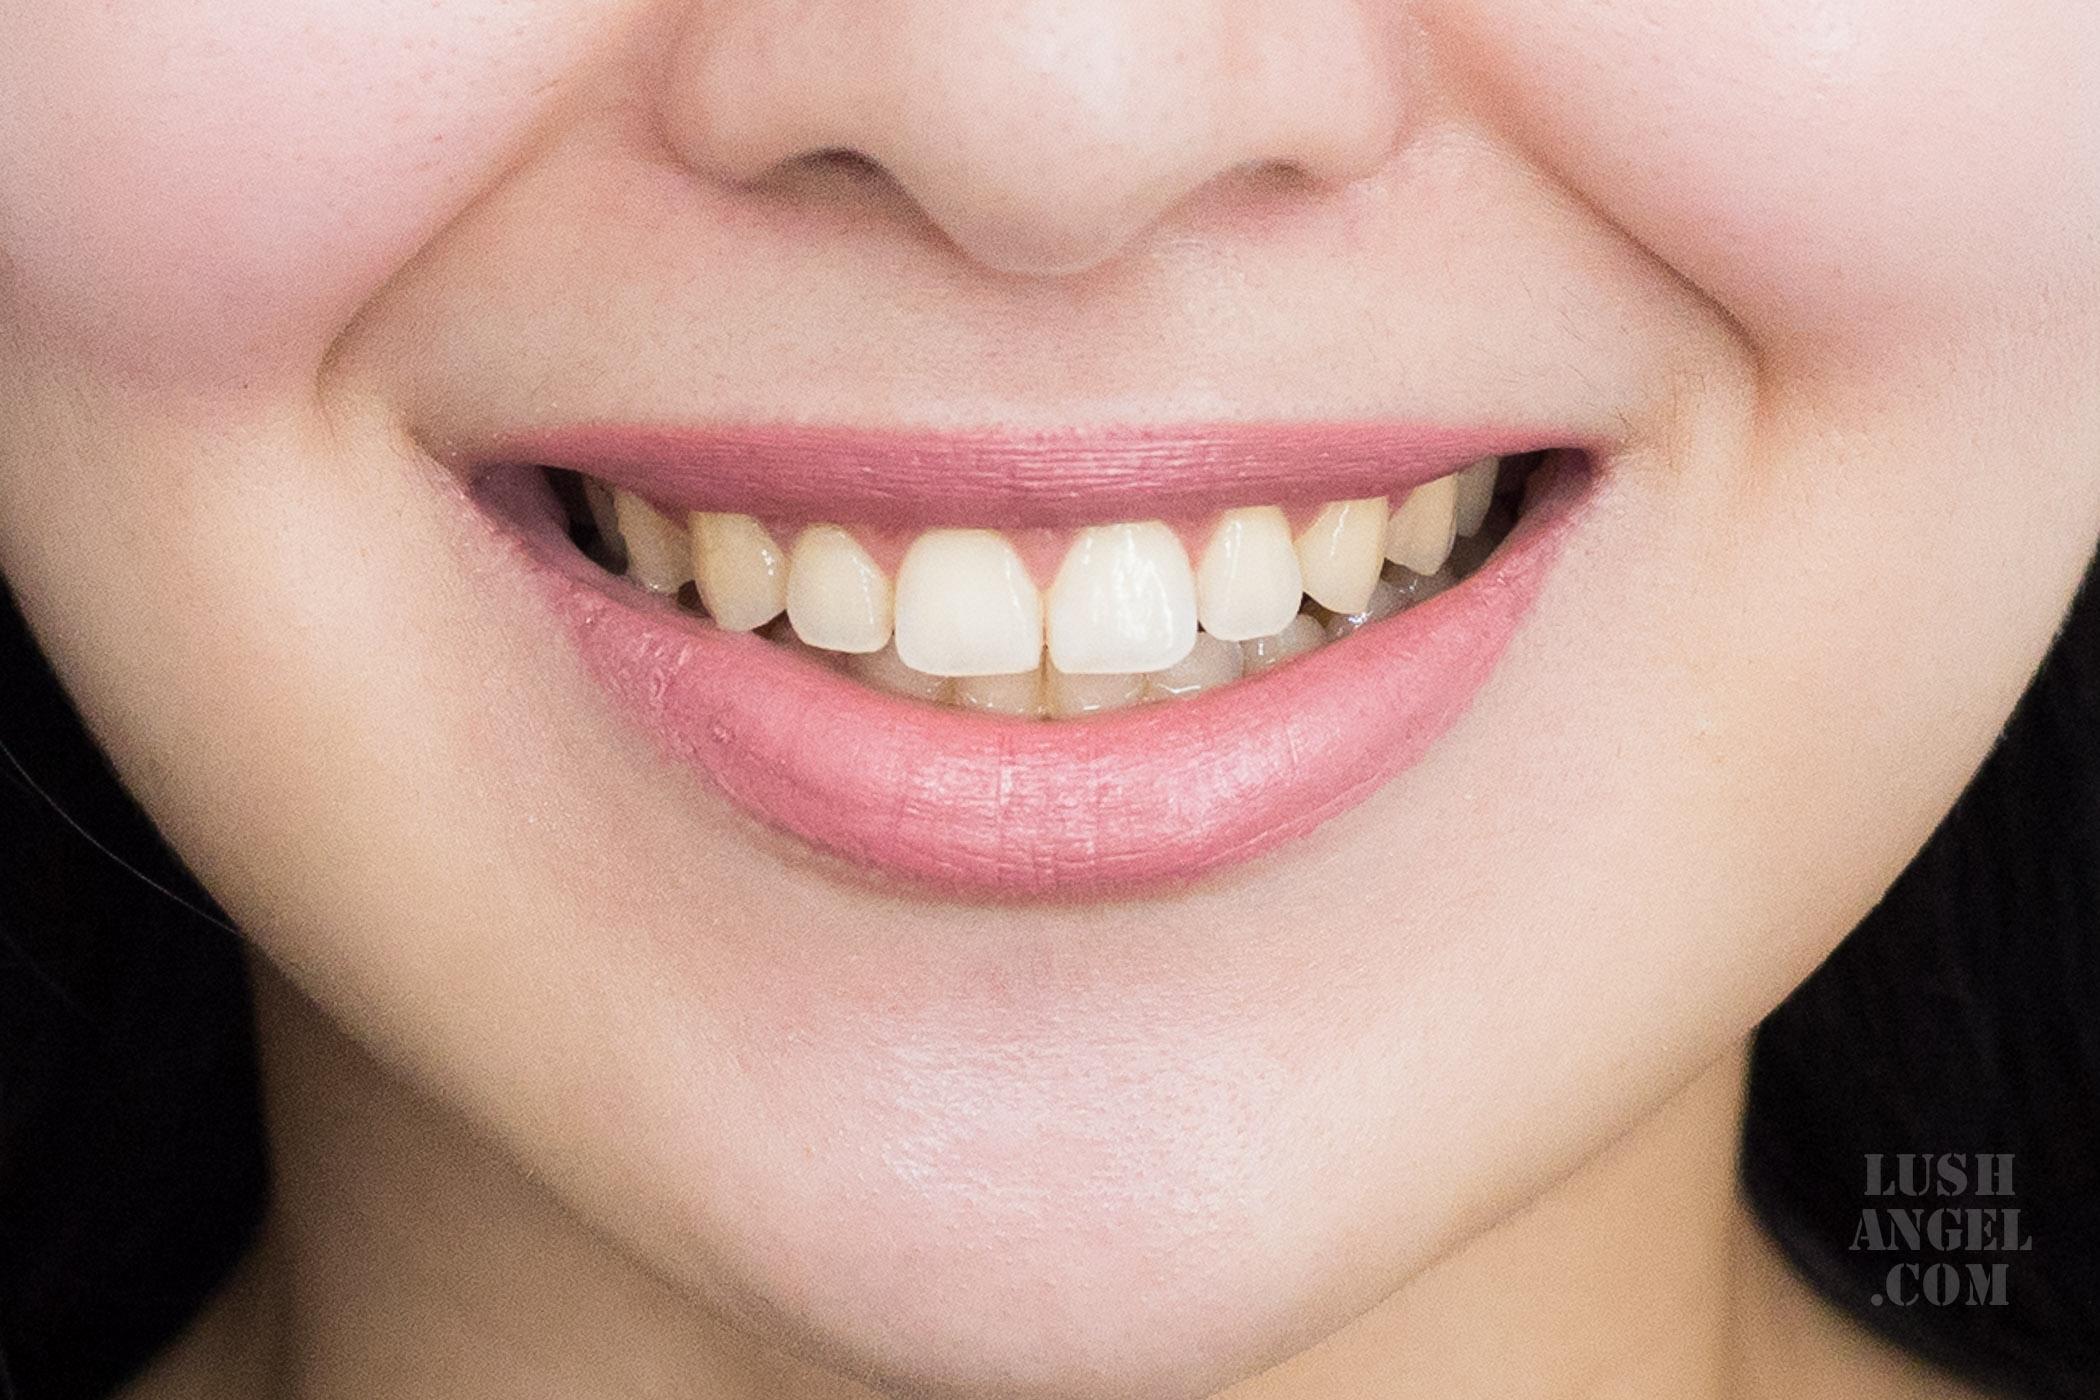 smile-bar-teeth-whitening-review